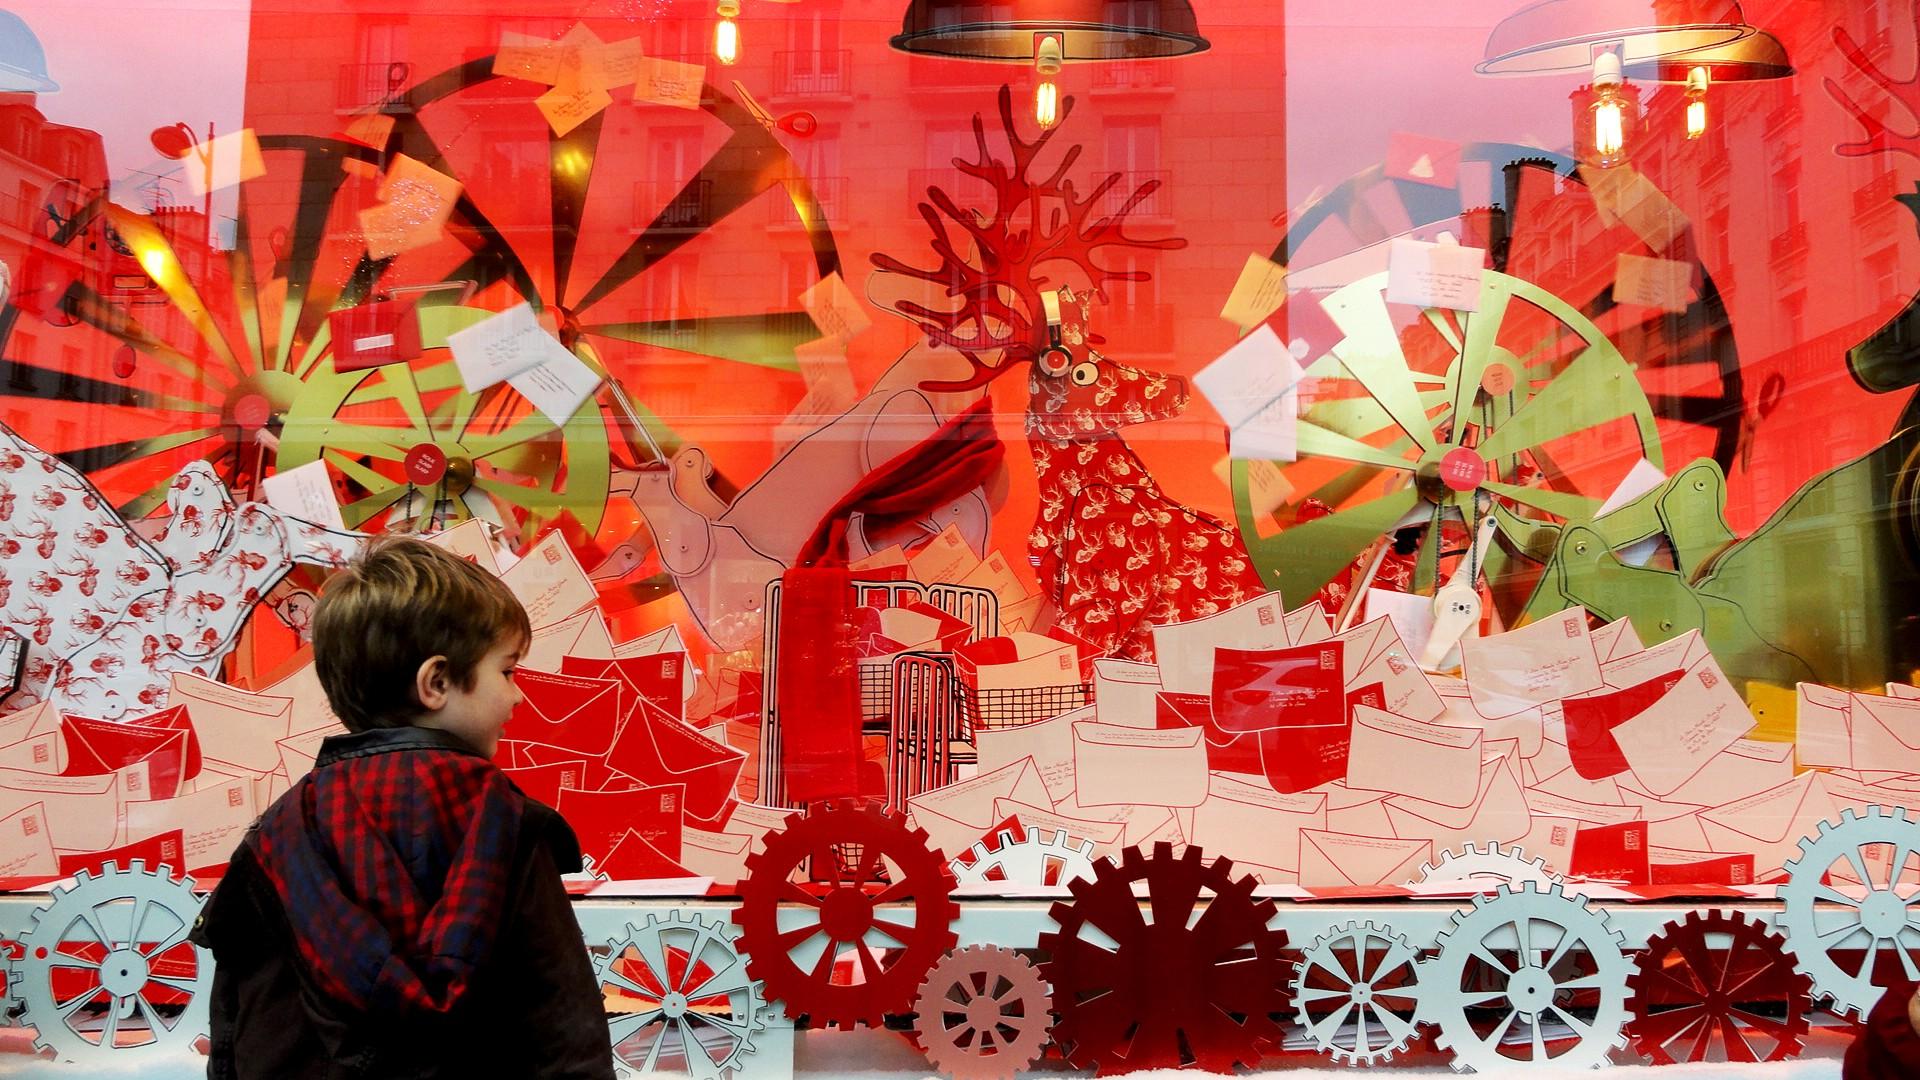 Noël 2014 au Bon Marché Rive Gauche